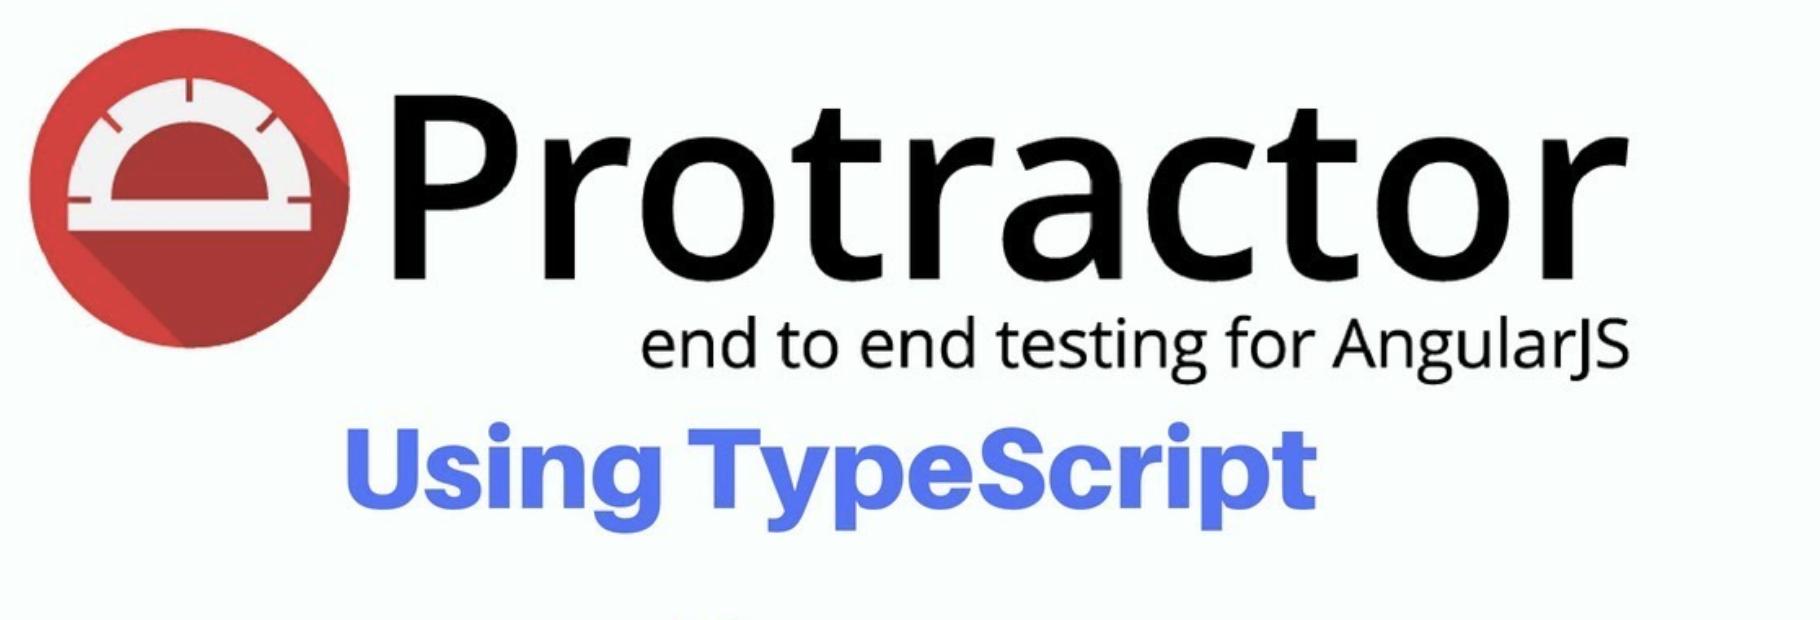 Разворачиваем автоматизацию за пару часов: TypeScript, Protractor, Jasmine - 1